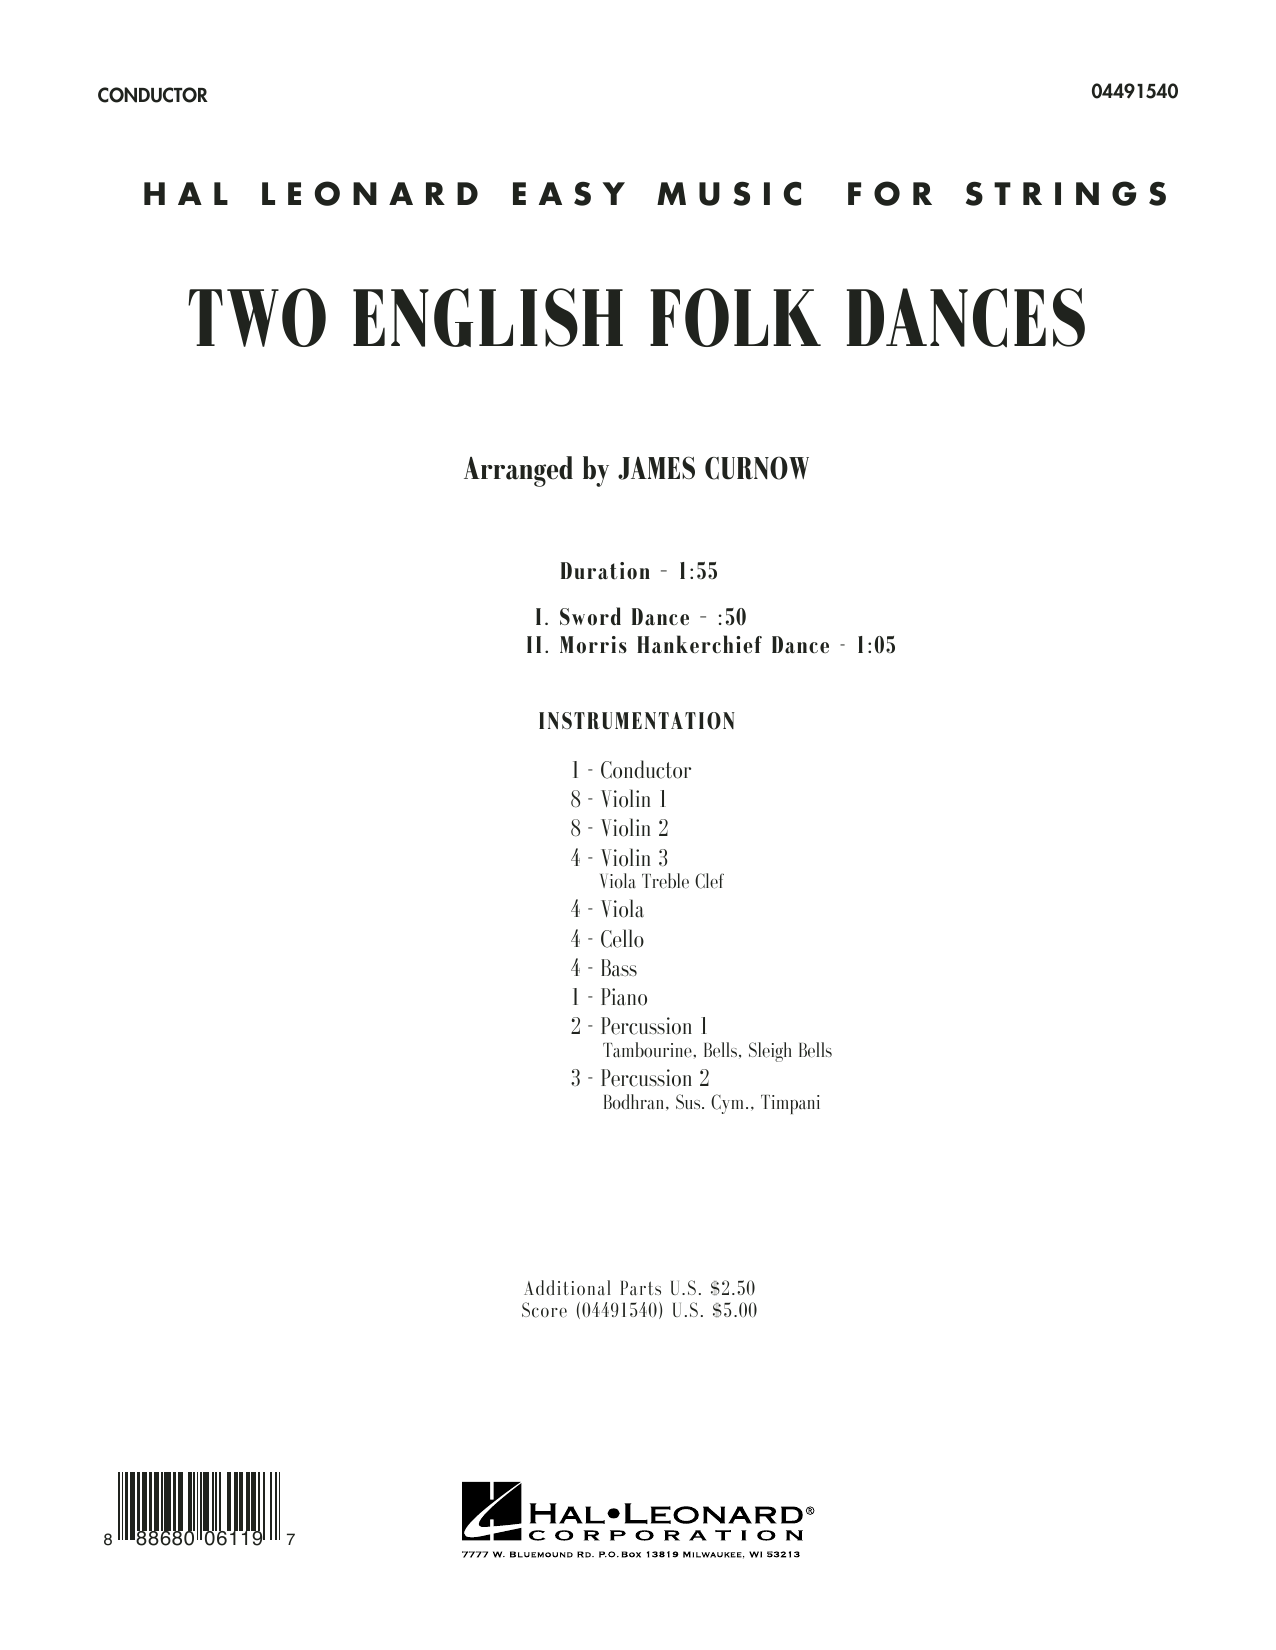 Two English Folk Dances - Conductor Score (Full Score) sheet music